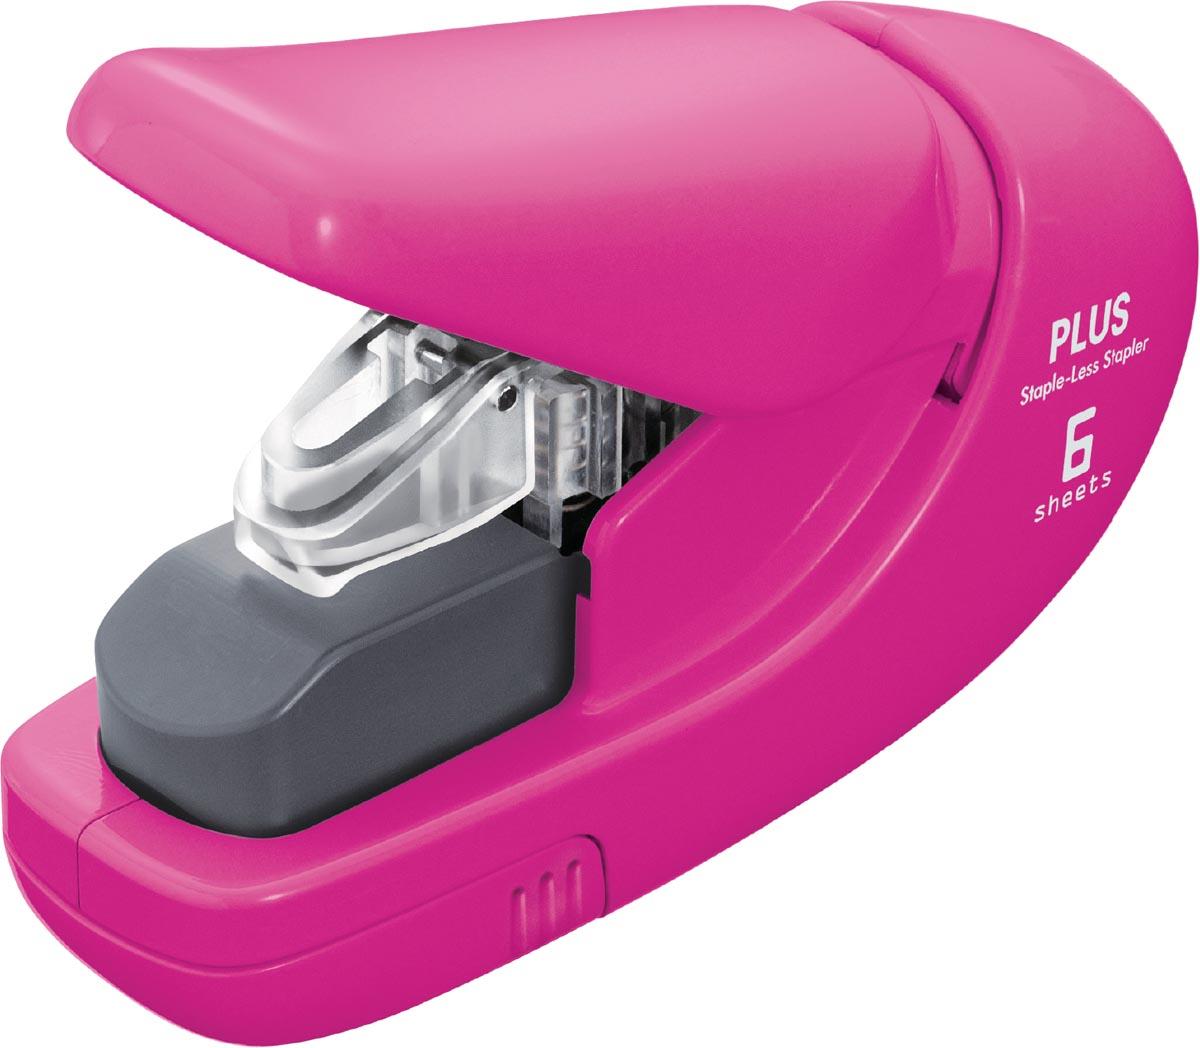 Plus nietloze nietmachine, roze